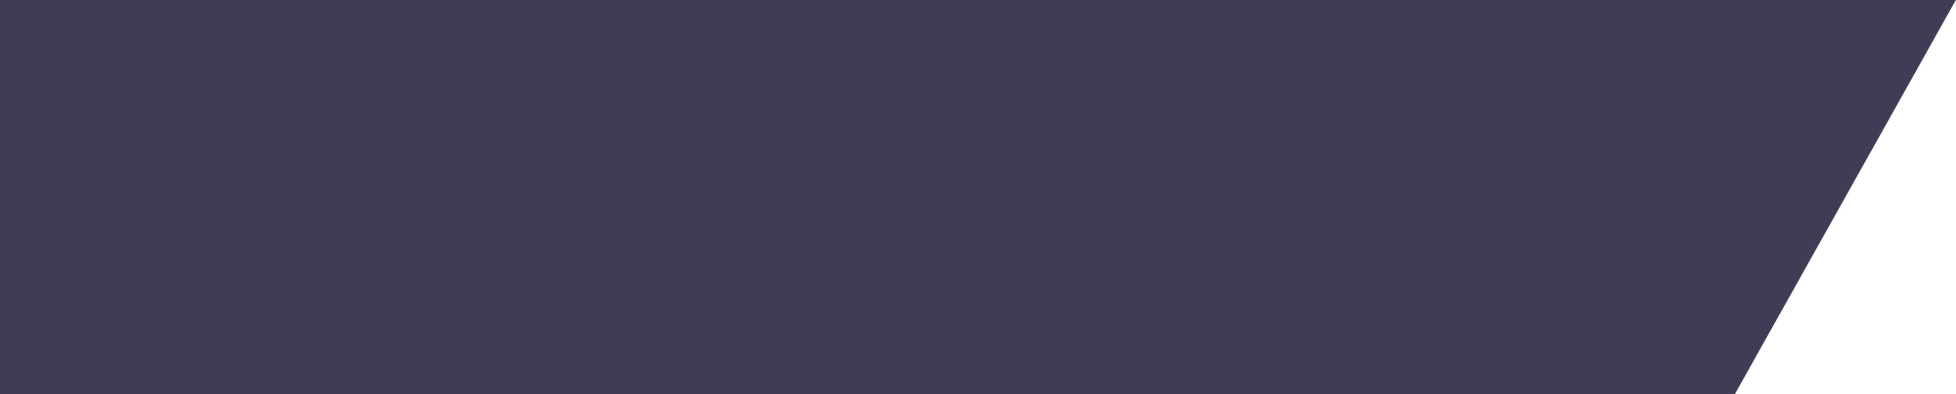 紫梯形左側.png